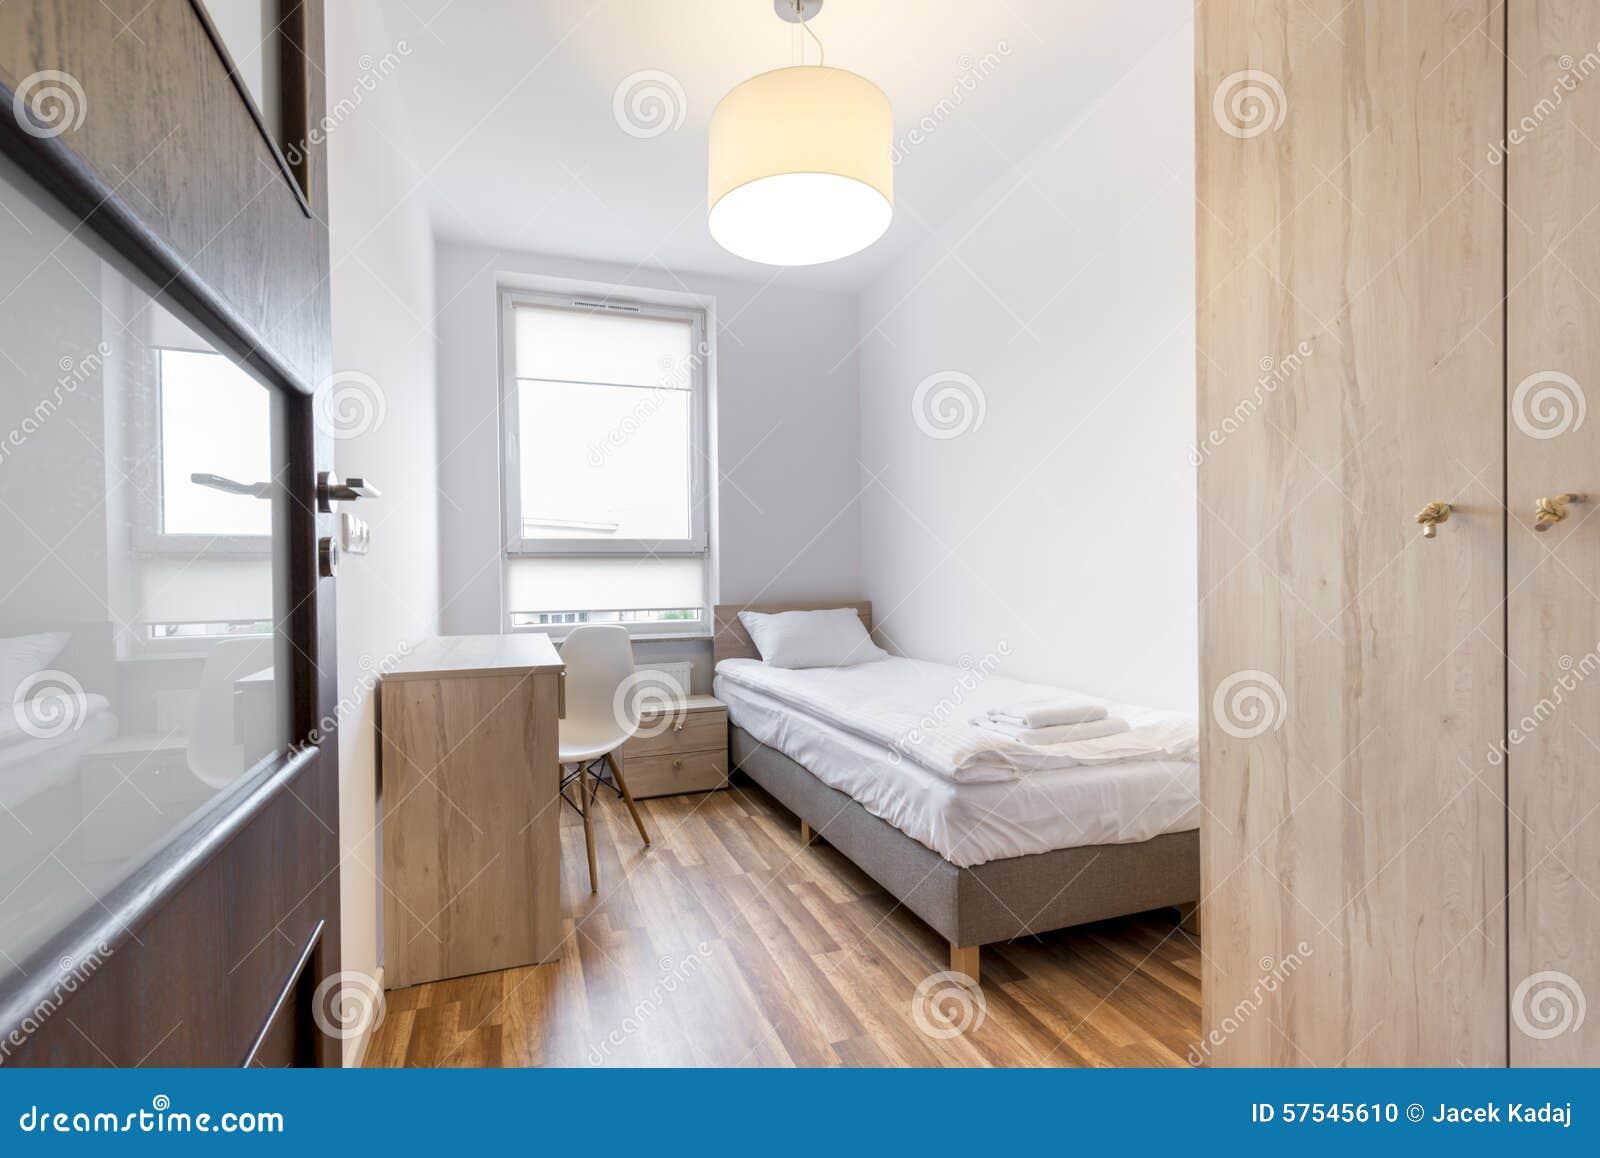 https://thumbs.dreamstime.com/z/modieuze-witte-slaapkamer-kleine-ruimte-57545610.jpg